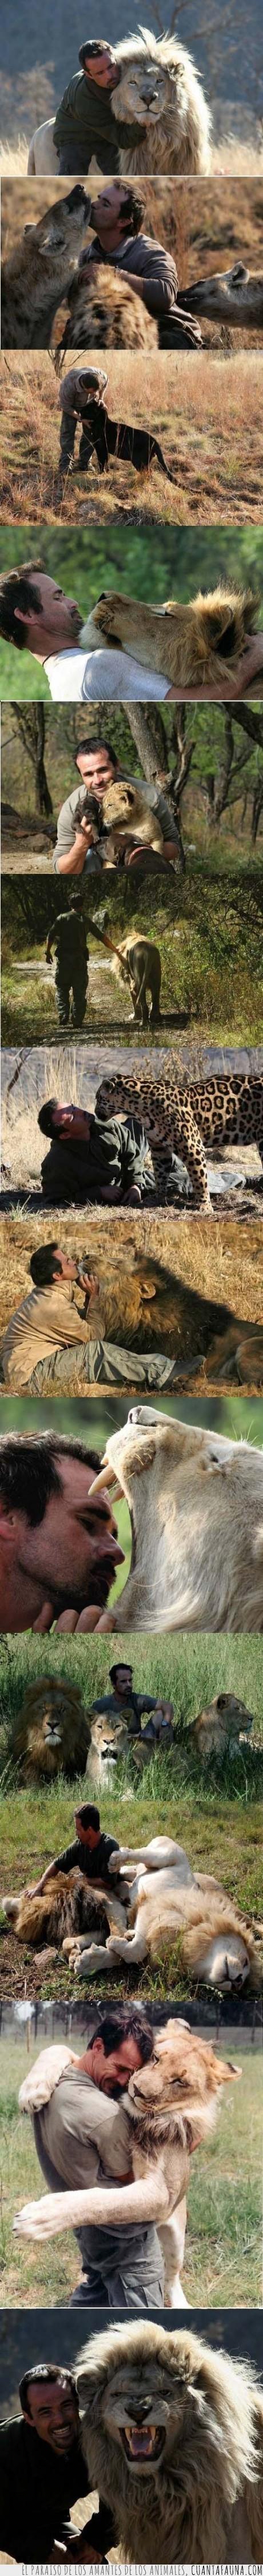 amigo,felino,guepardo,kevin richardson,leon,leopardo,pantera,whisperer